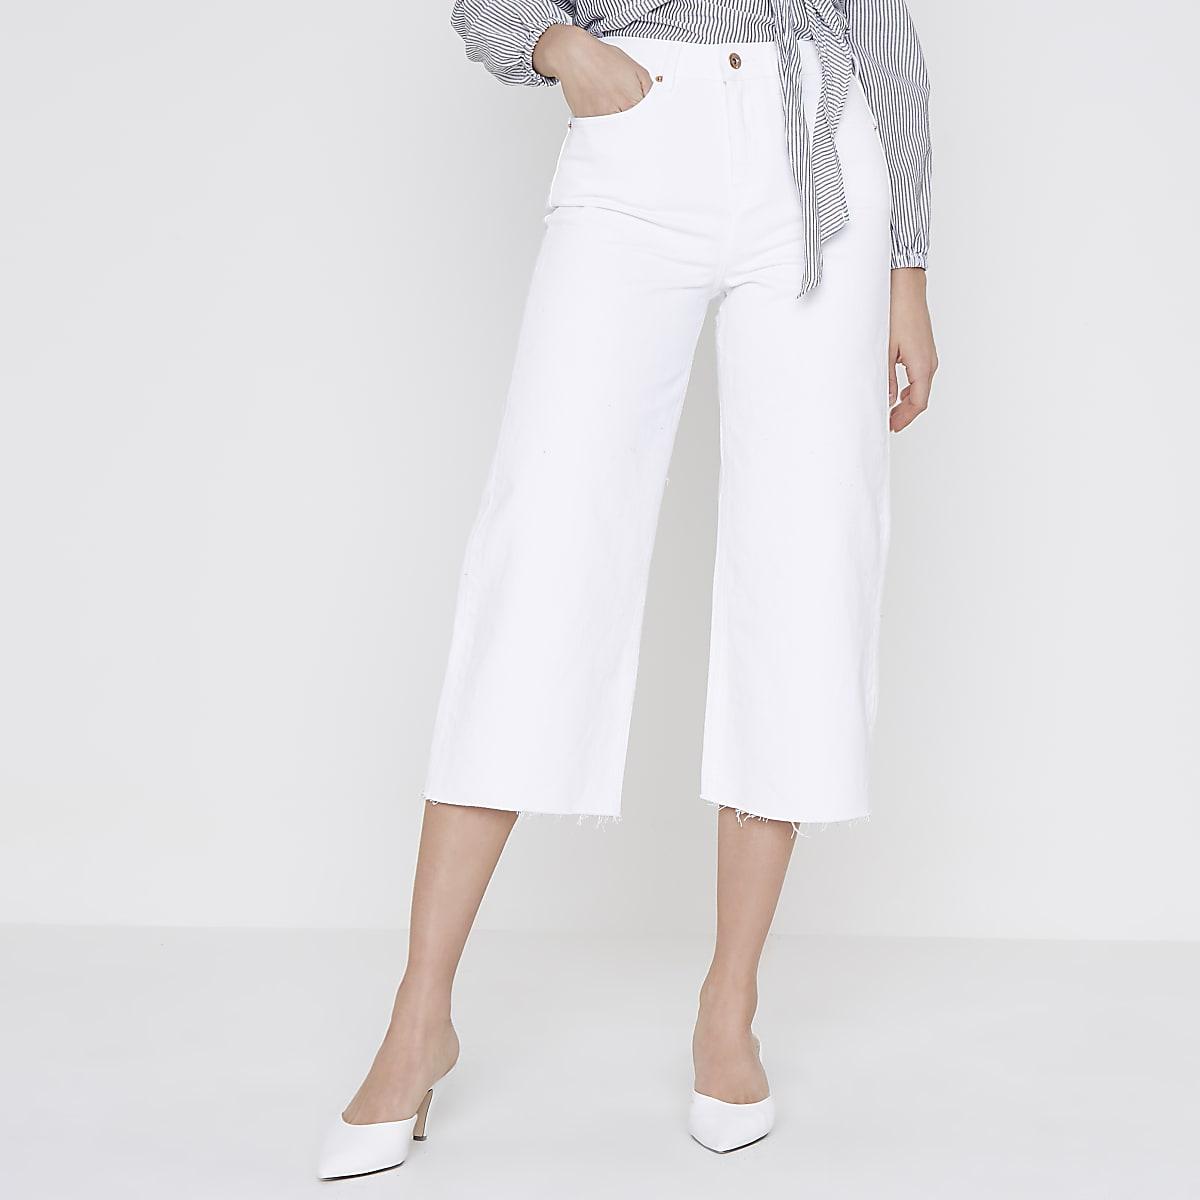 8dca851e46da White Alexa cropped wide leg jeans - Bootcut   Flared Jeans - Jeans - women